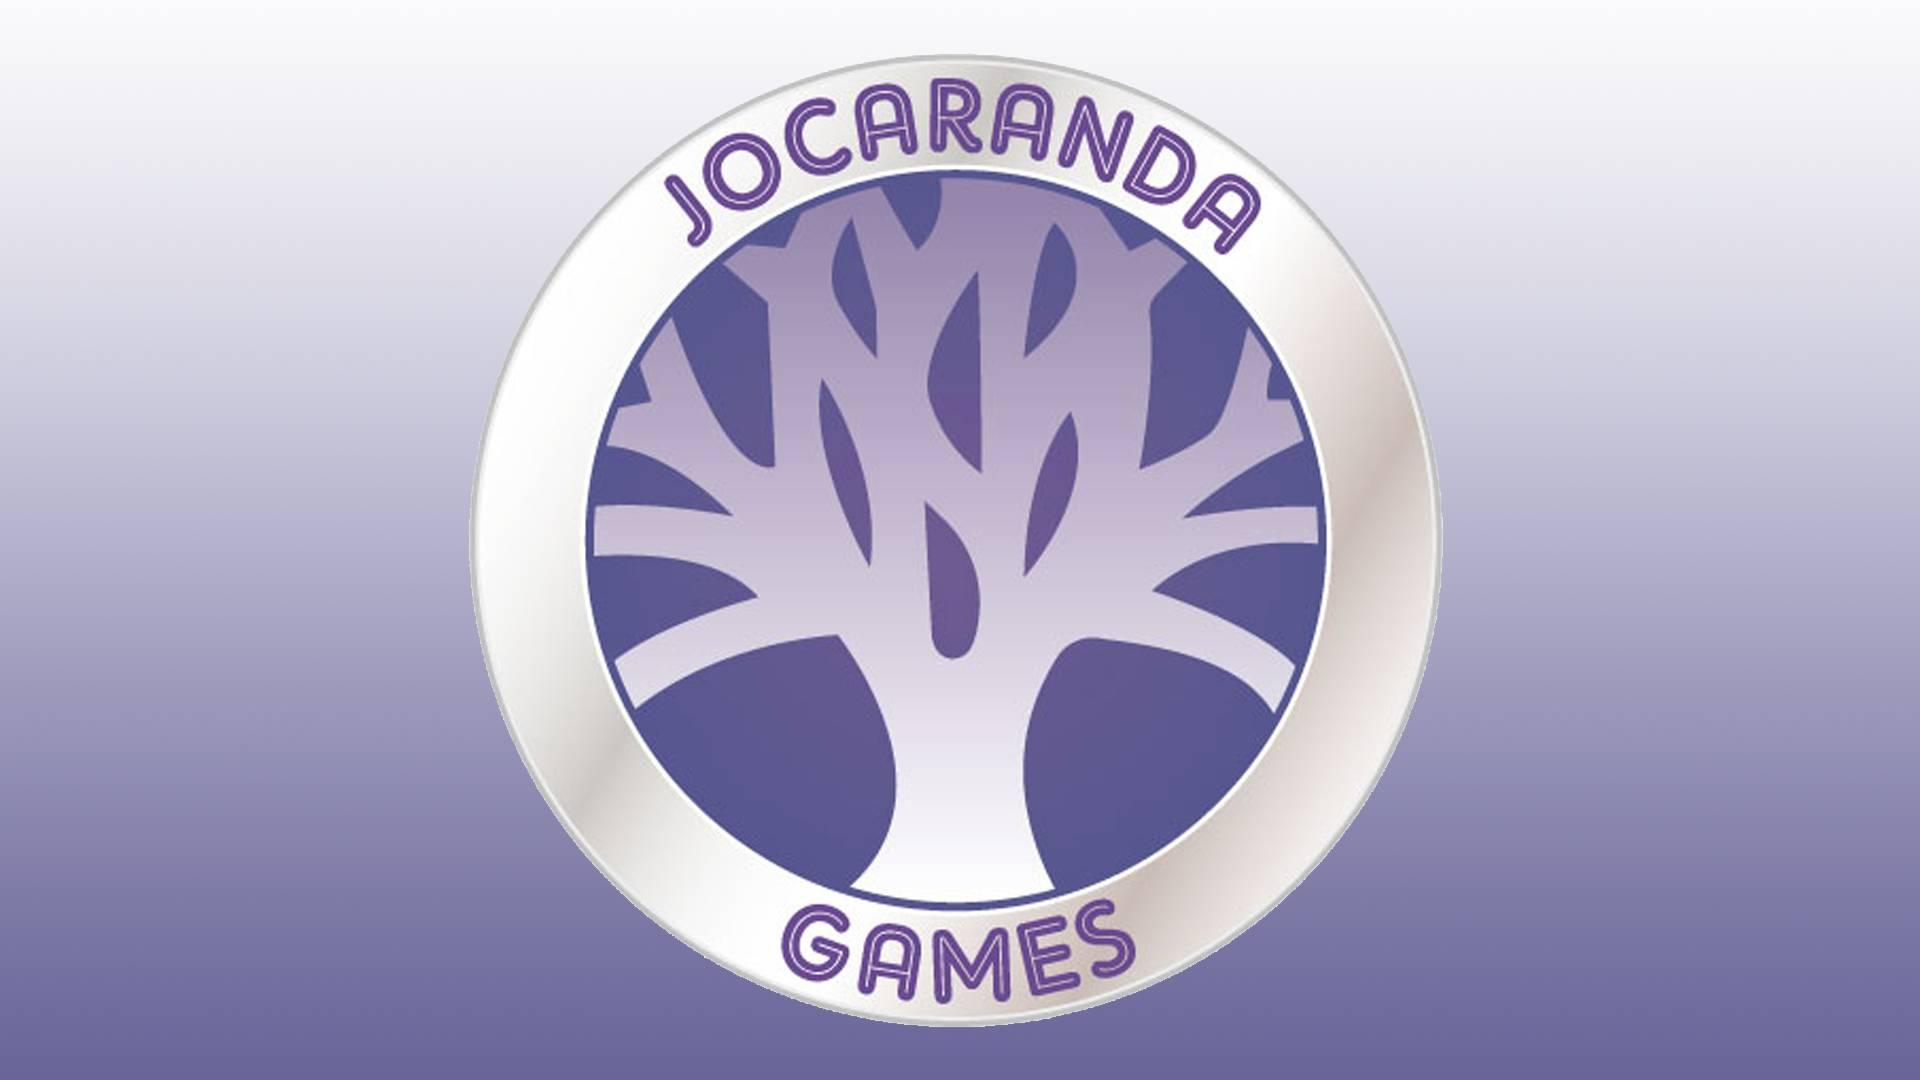 Jocaranda Games